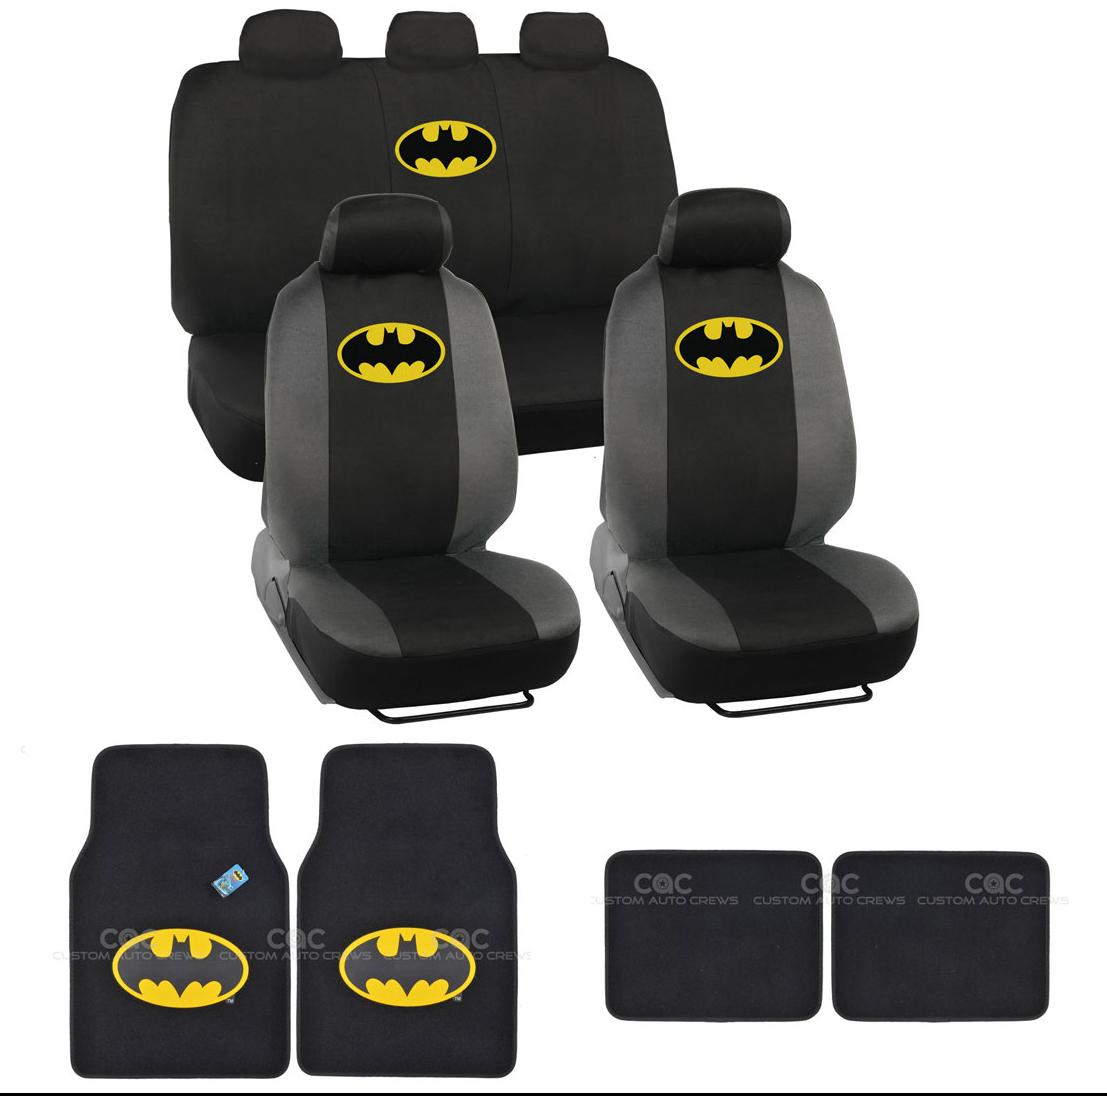 batman car chair ikea white rocking seat covers yellow on black logo w matching